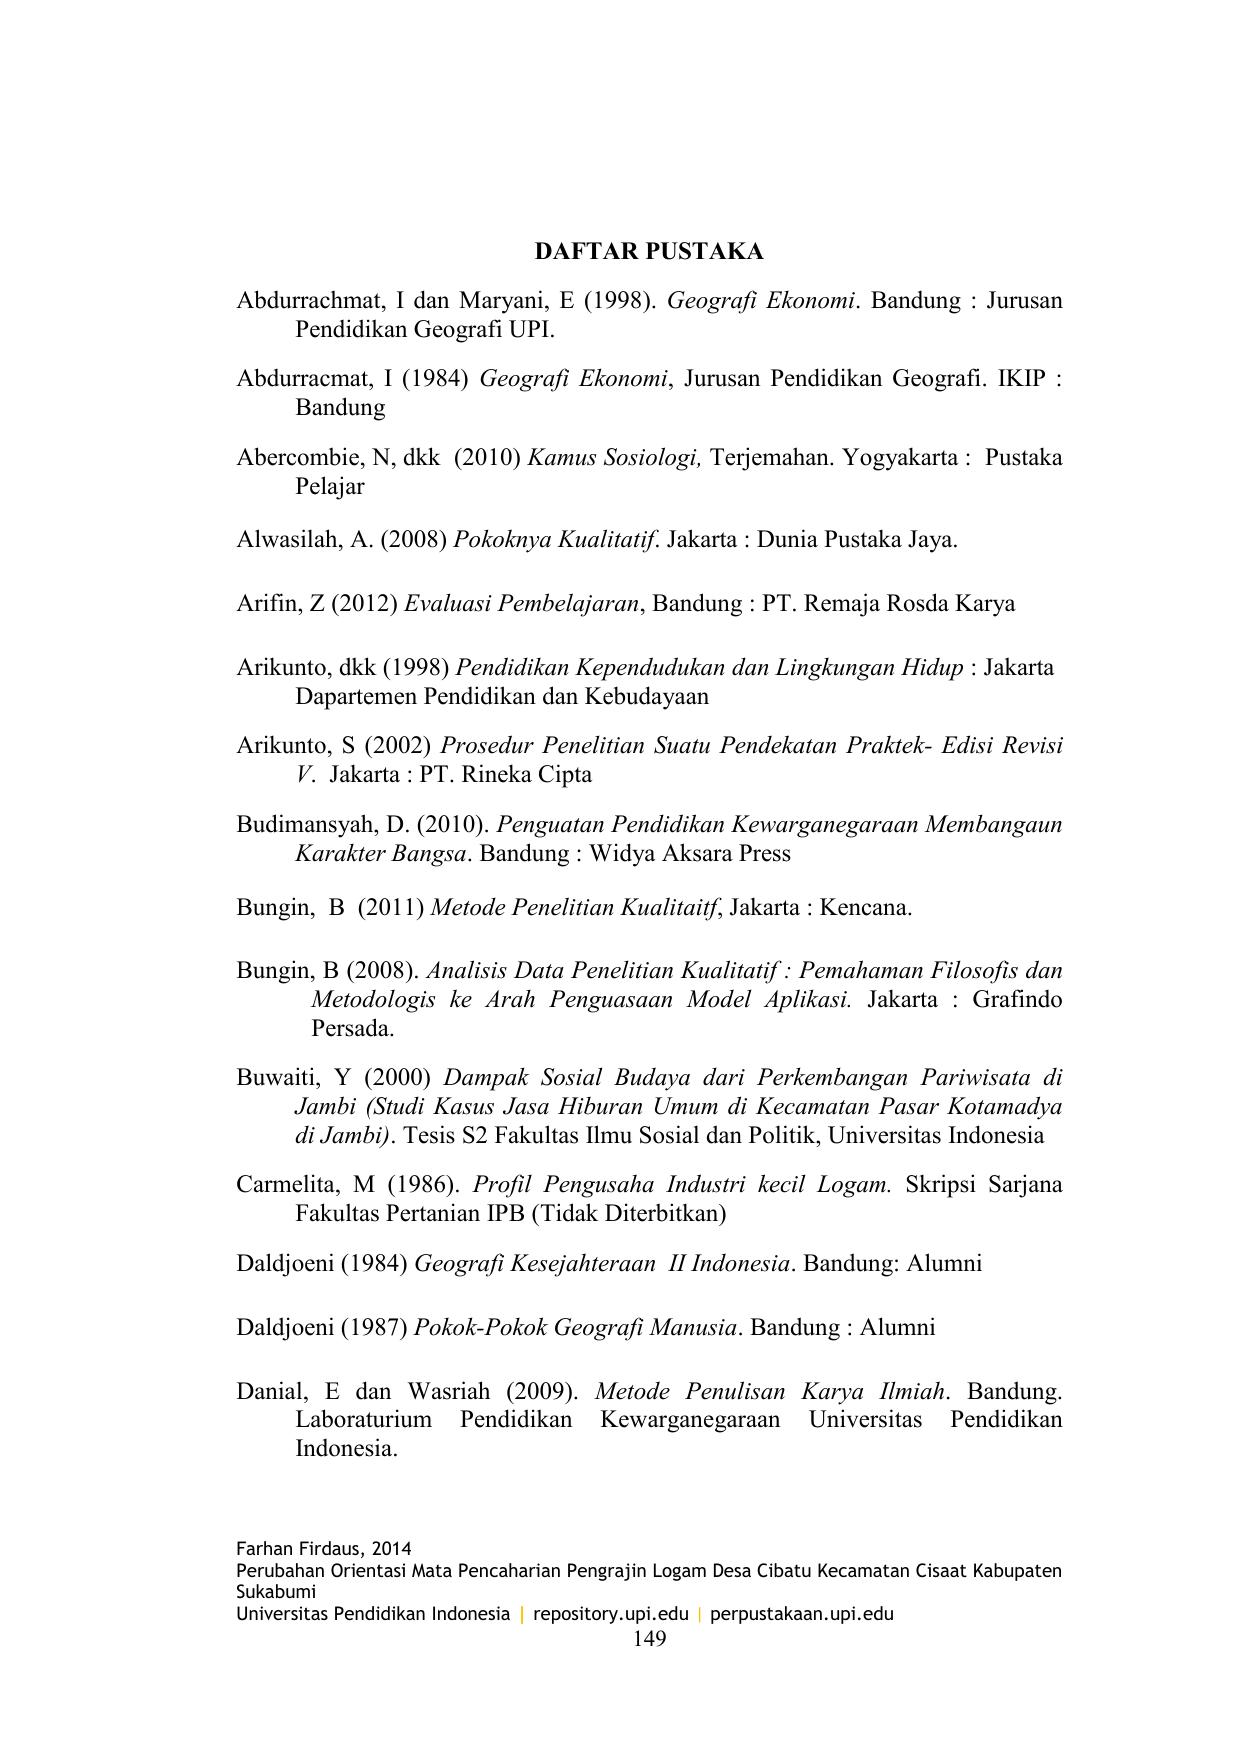 Daftar Pustaka Abdurrachmat I Dan Maryani E